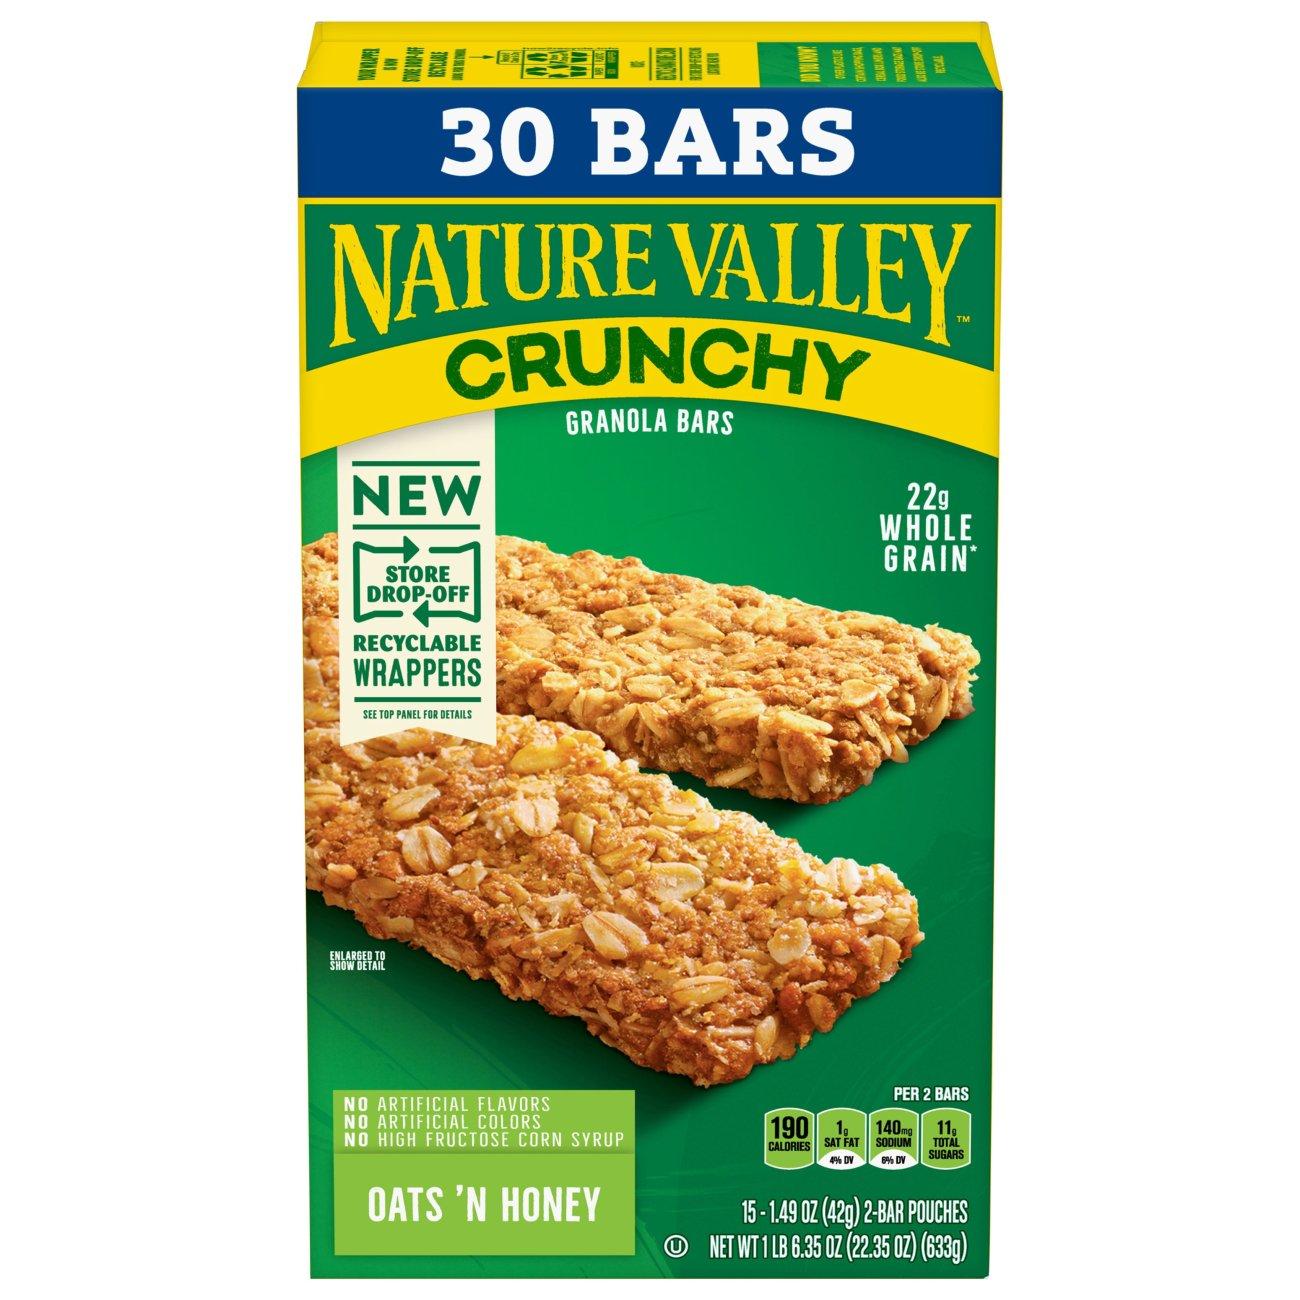 Oats 'n Honey Crunchy Granola Bars